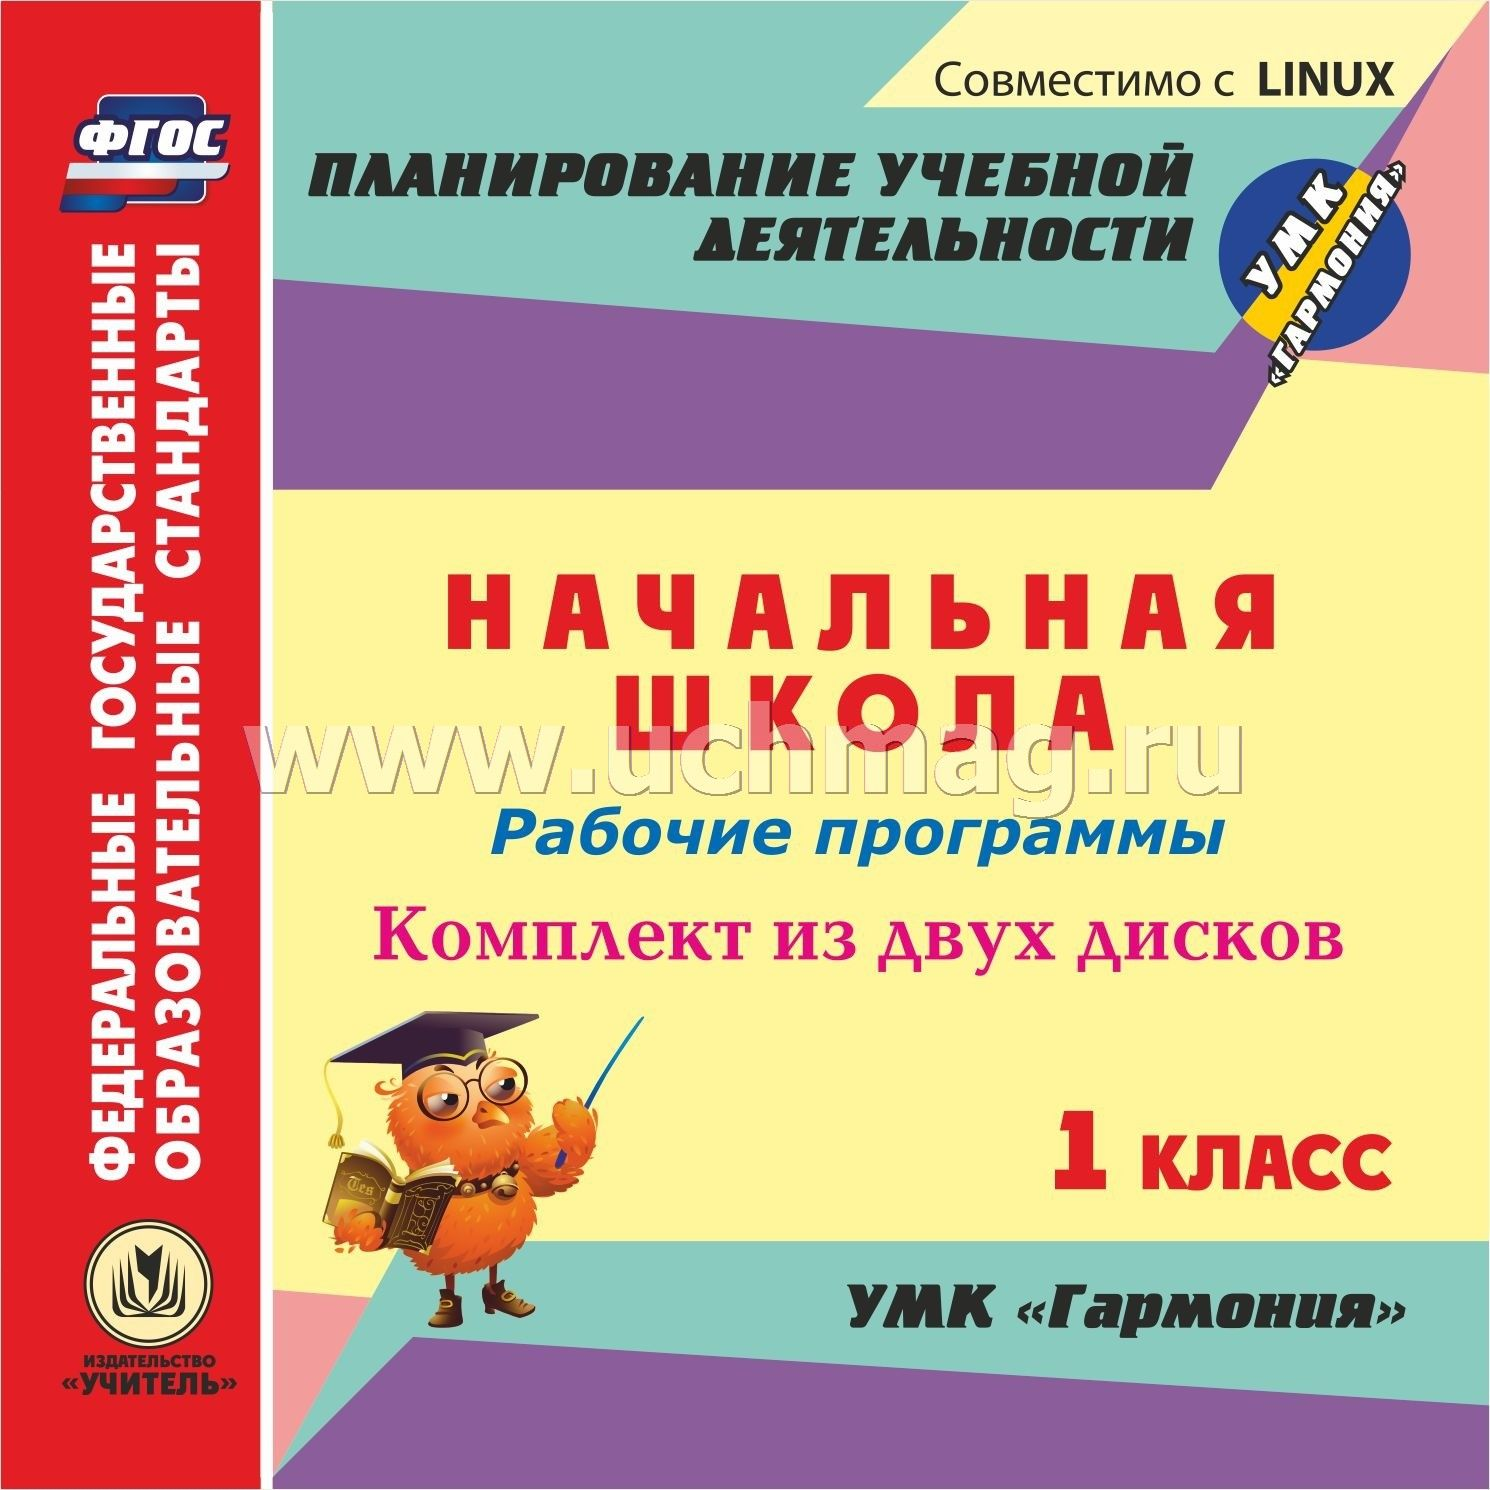 Программа По Обж Латчук